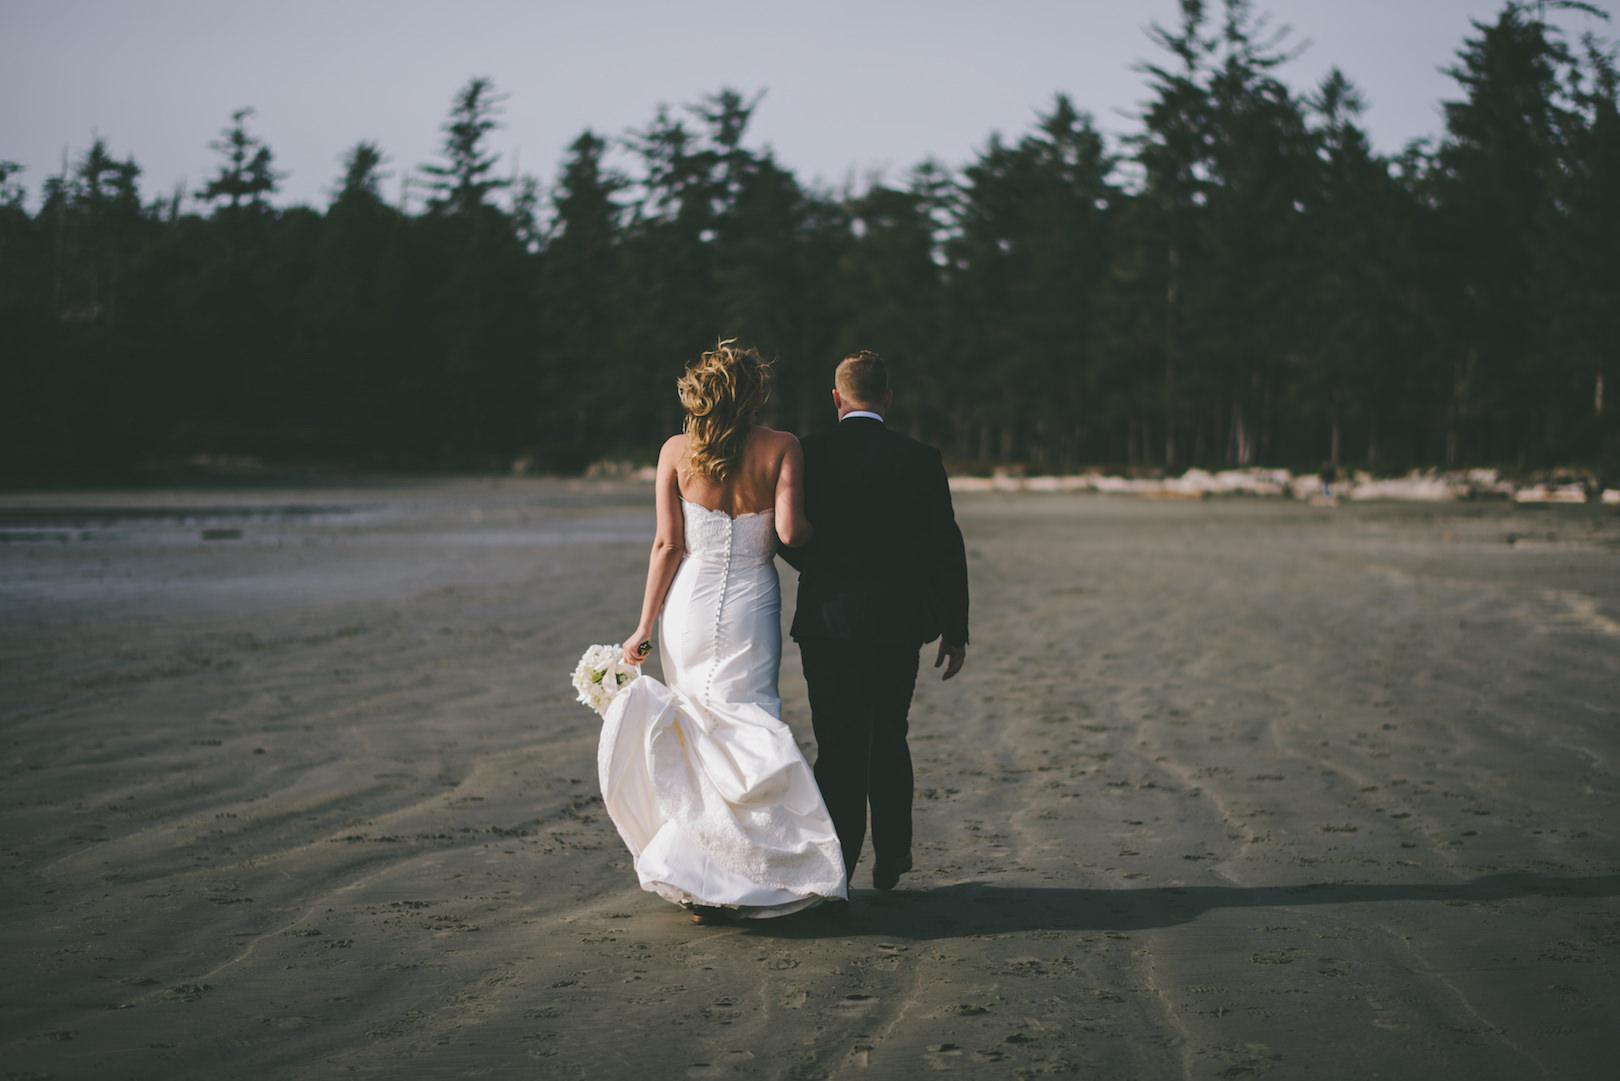 Wedding photographers Tofino